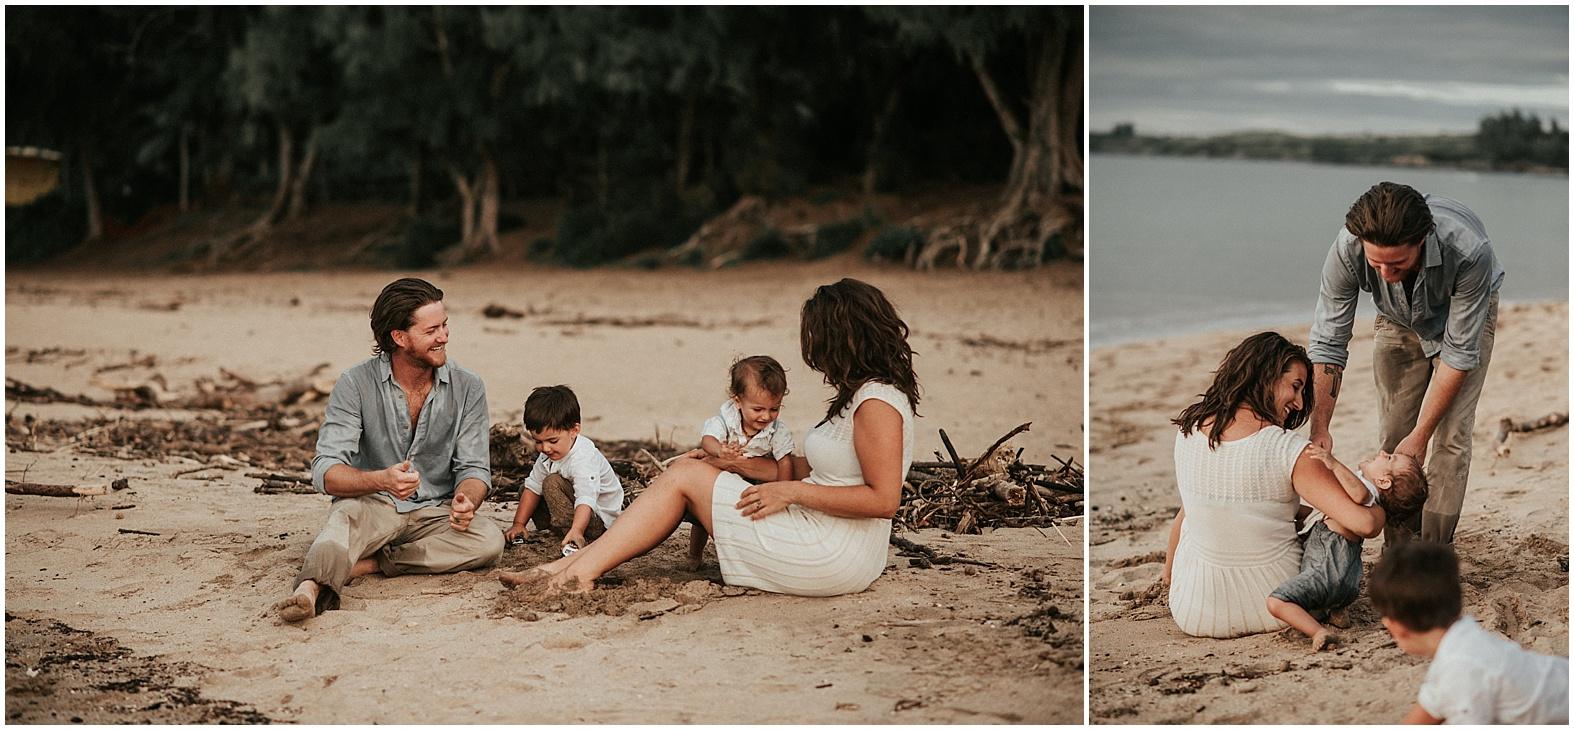 Maui family photography10.jpg